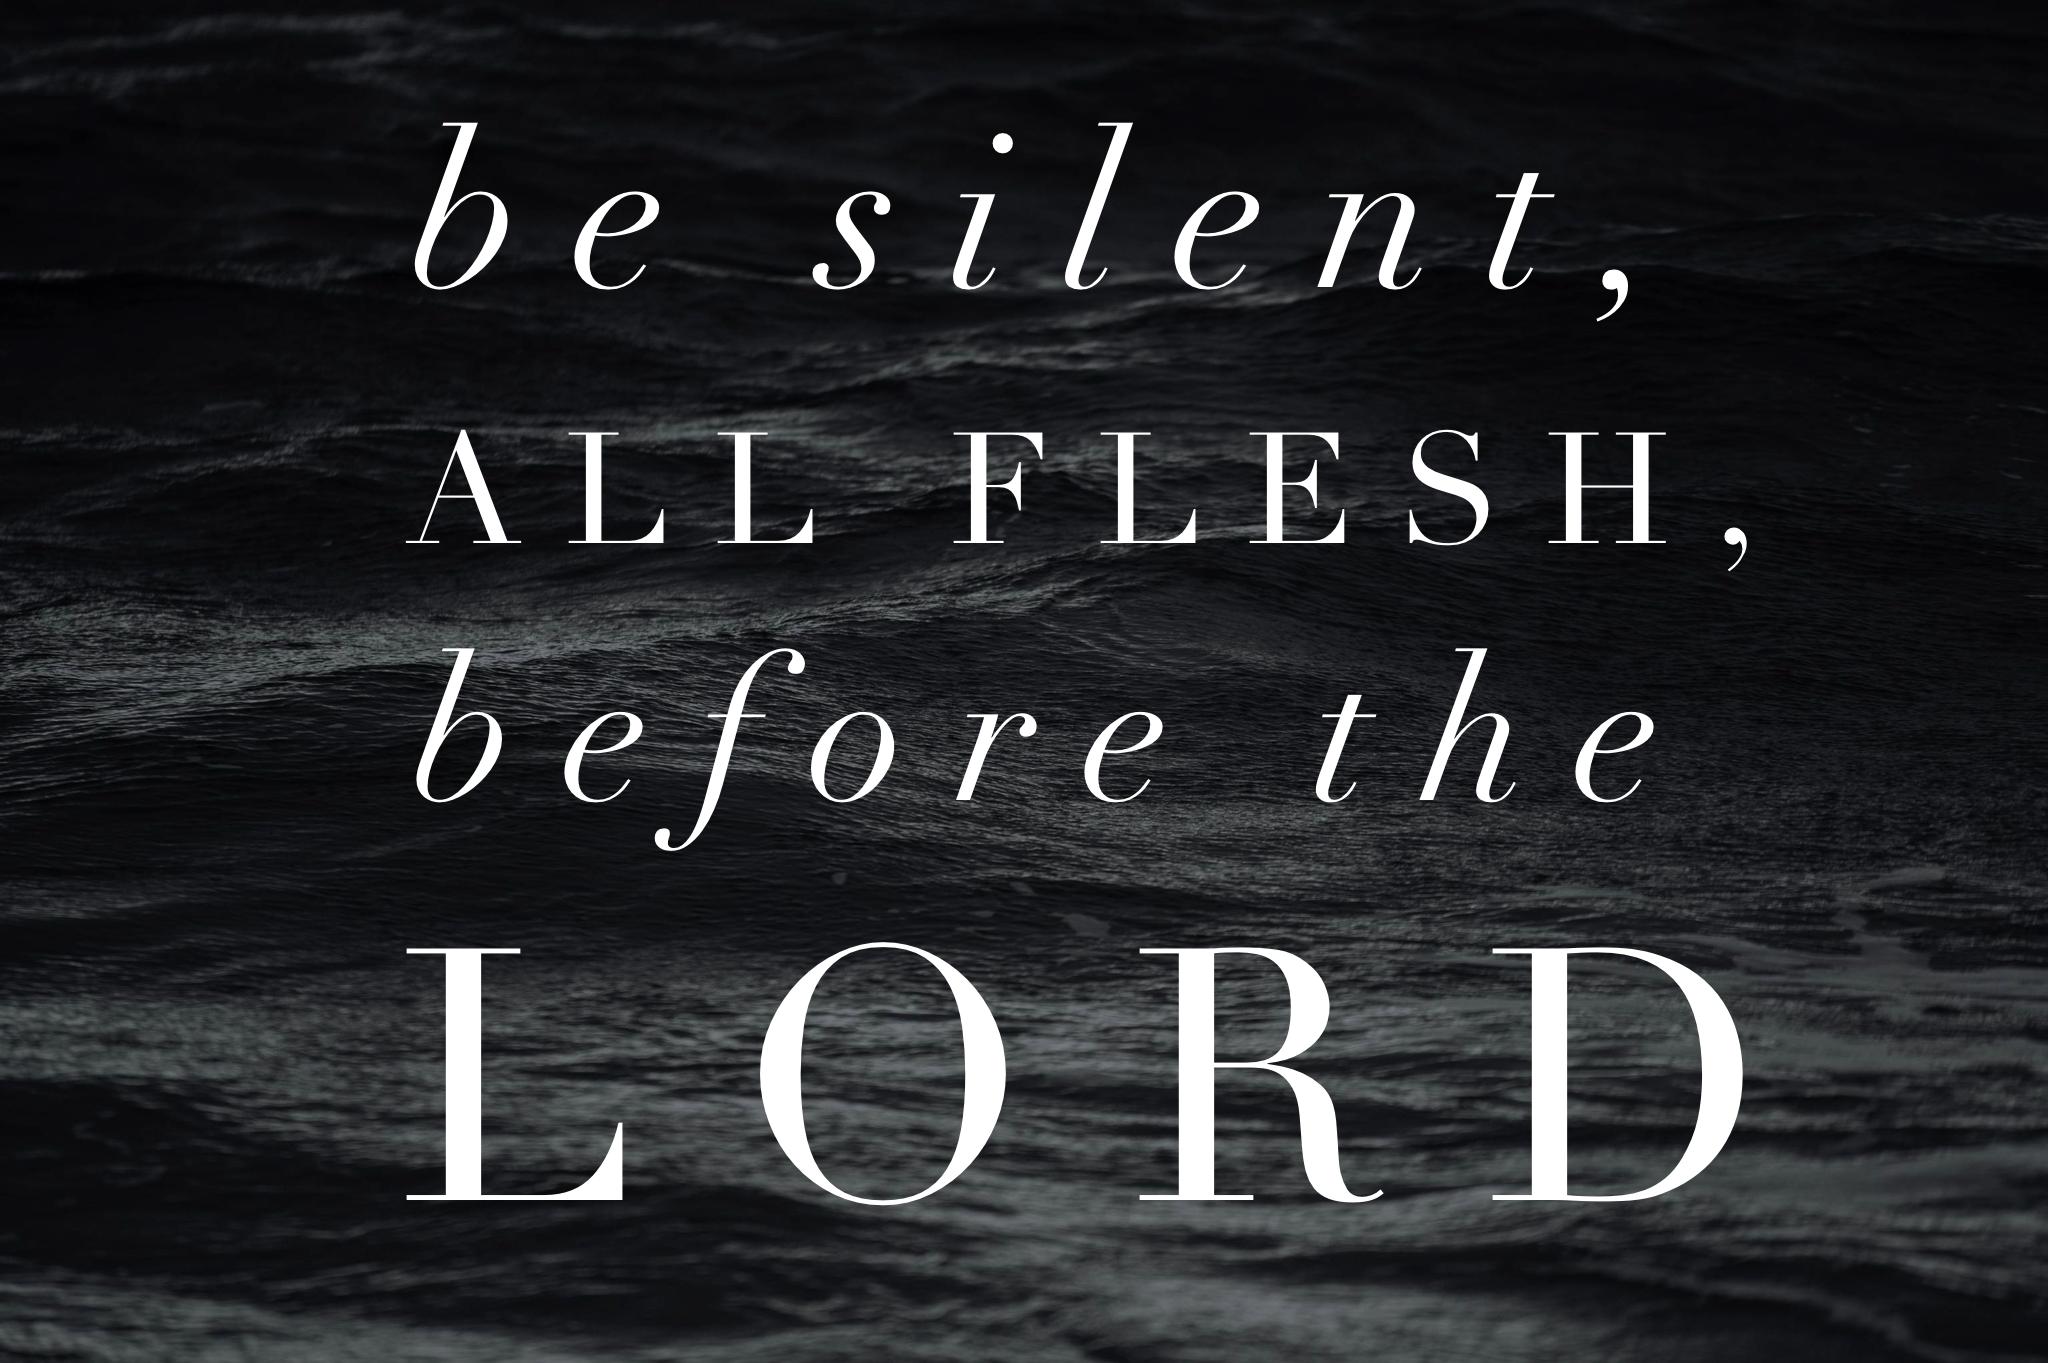 Do you want to hear God speak? Do you want to hear Him answer? Do you want to see Him send you into amazing Kingdom work? Do you want to walk with Him intimately, like a friend?